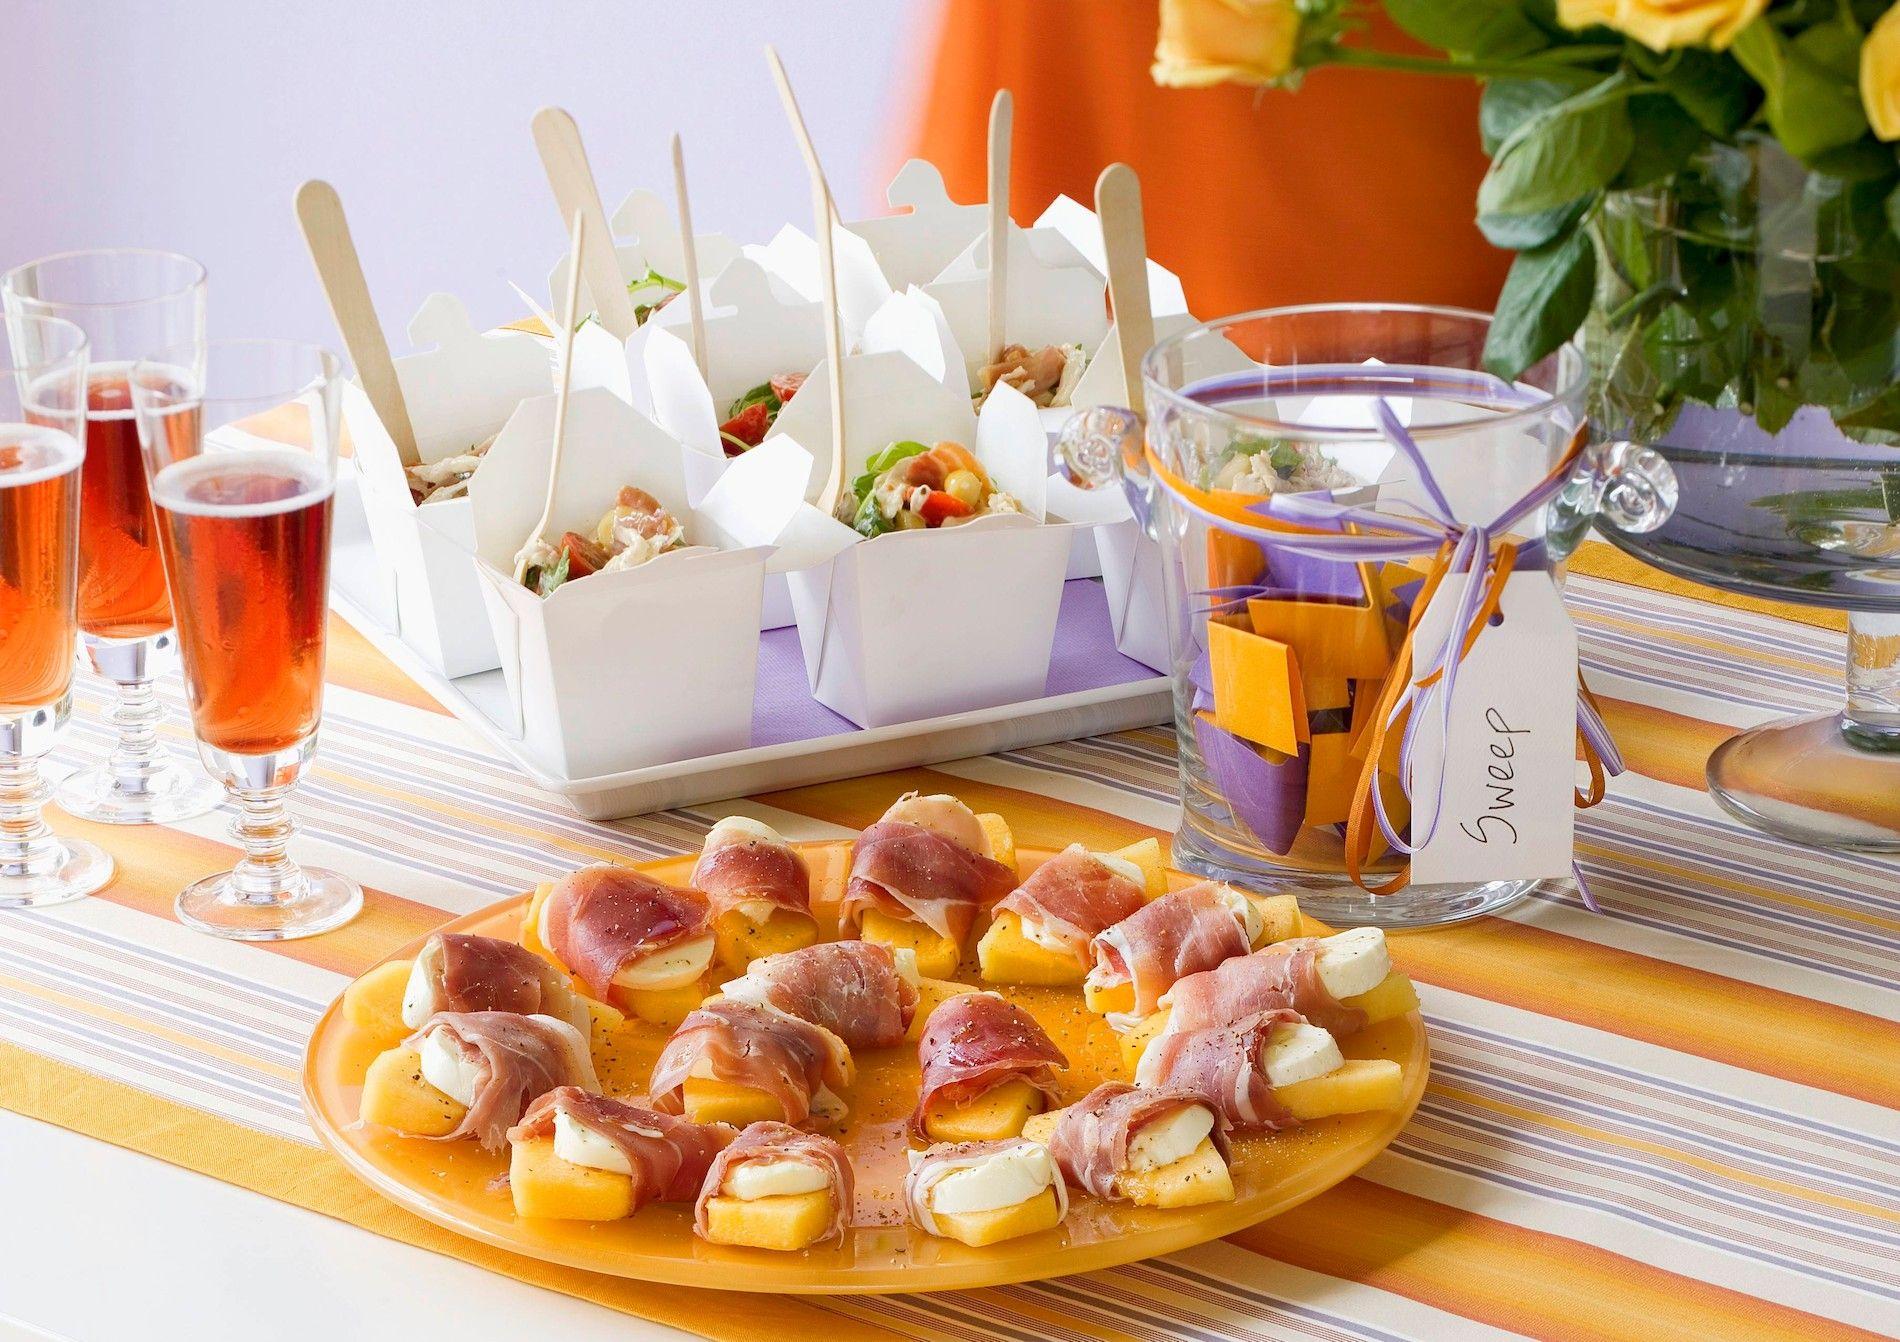 Menu fiesta de cumplea os sano adultos buscar con google for Decoracion de ensaladas